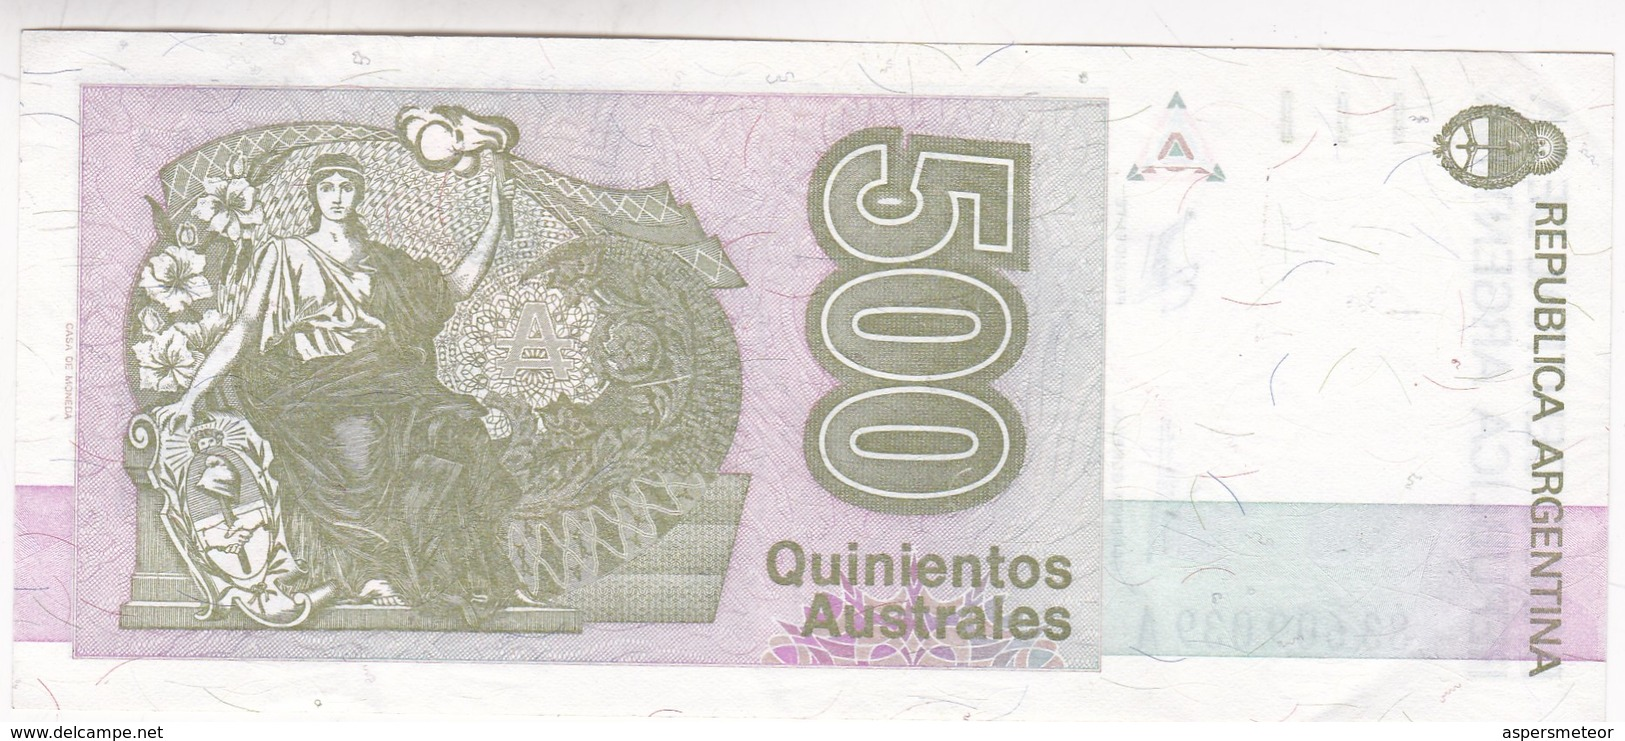 BANCO CENTRAL DE LA REPUBLICA ARGENTINA 500 AUSTRALES NICOLAS AVELLANEDA - BLEUP - Argentine